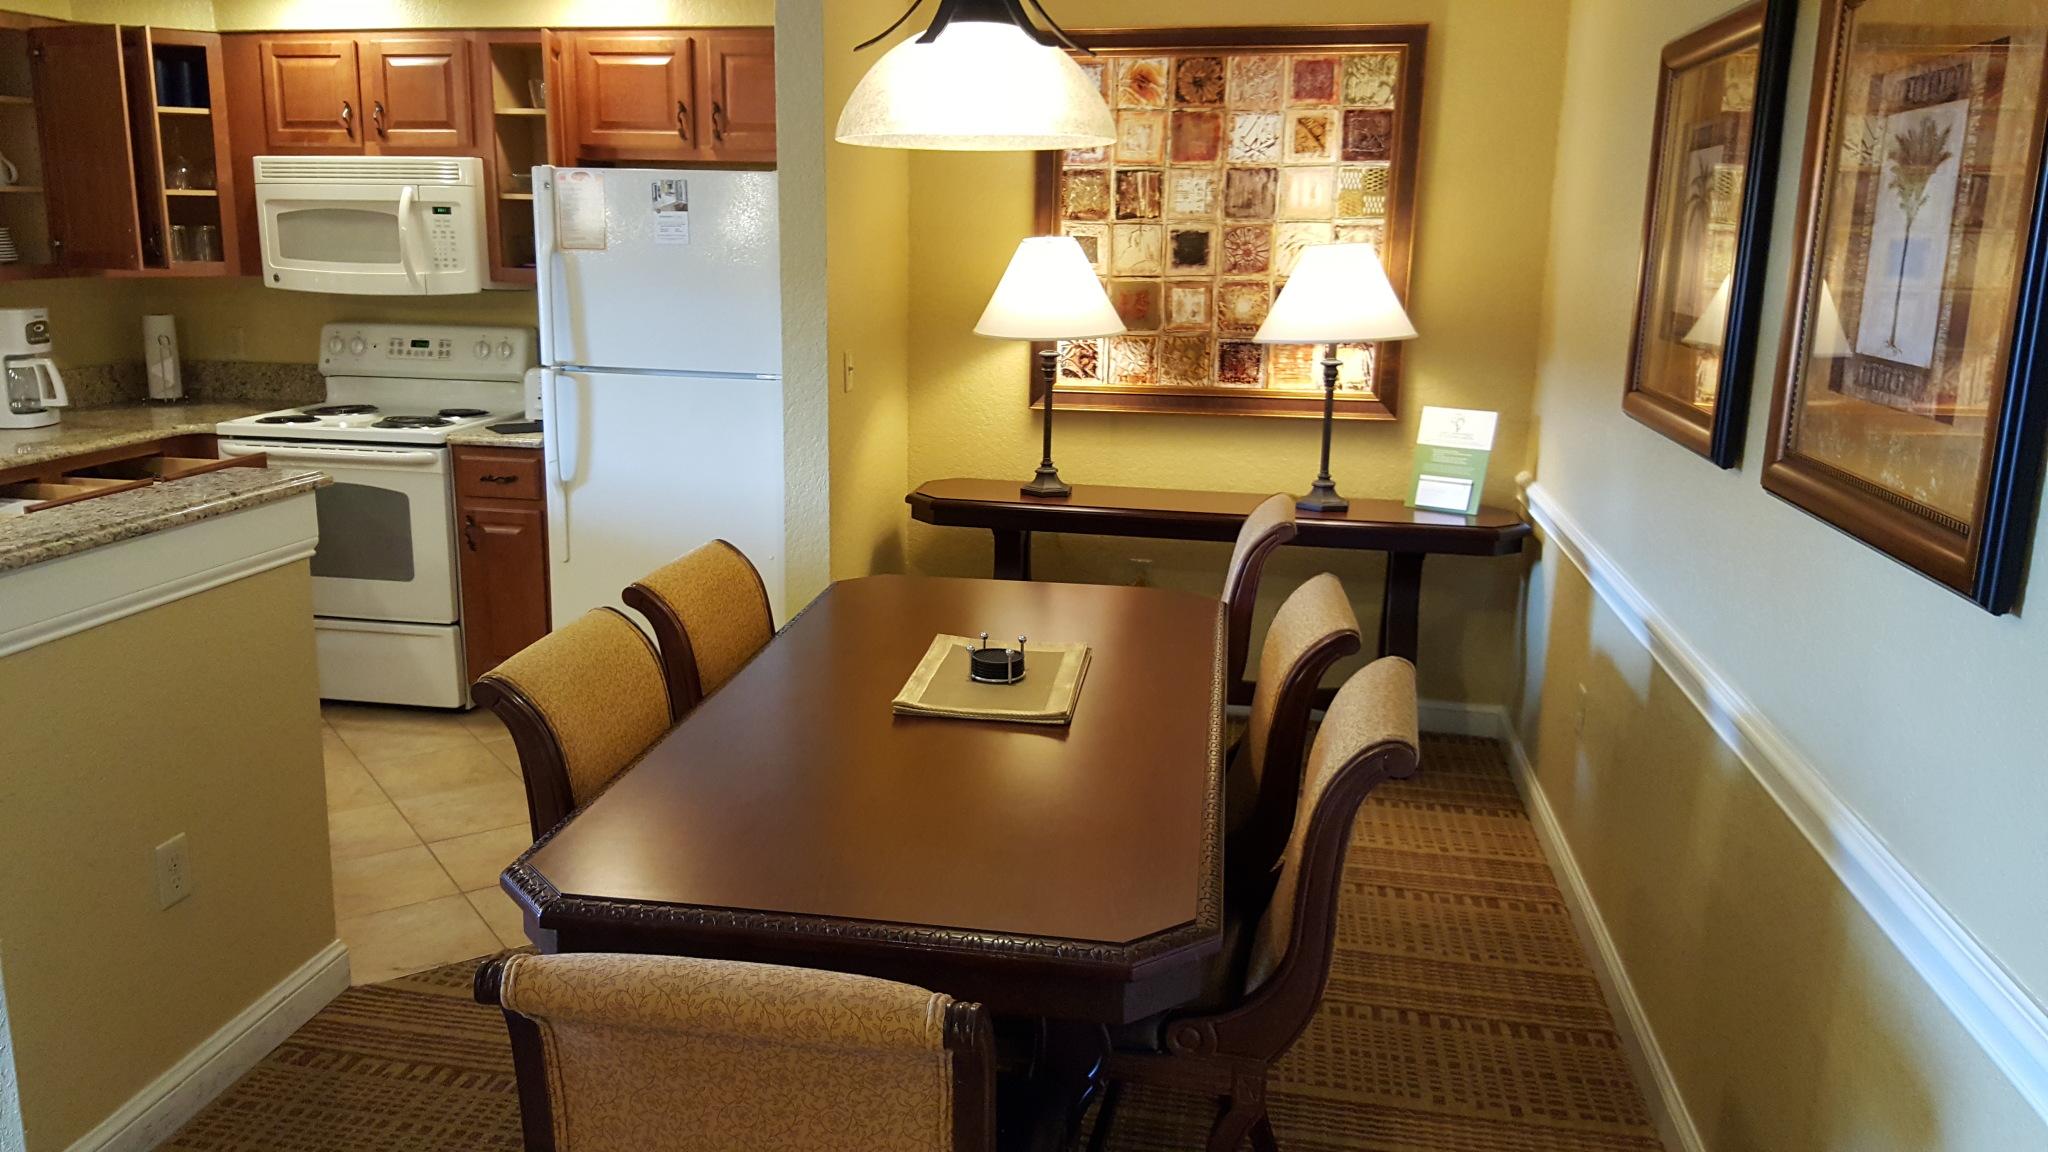 Apartment Bonnet Creek Orlando 3 Bedroom 2 Bath photo 16825339